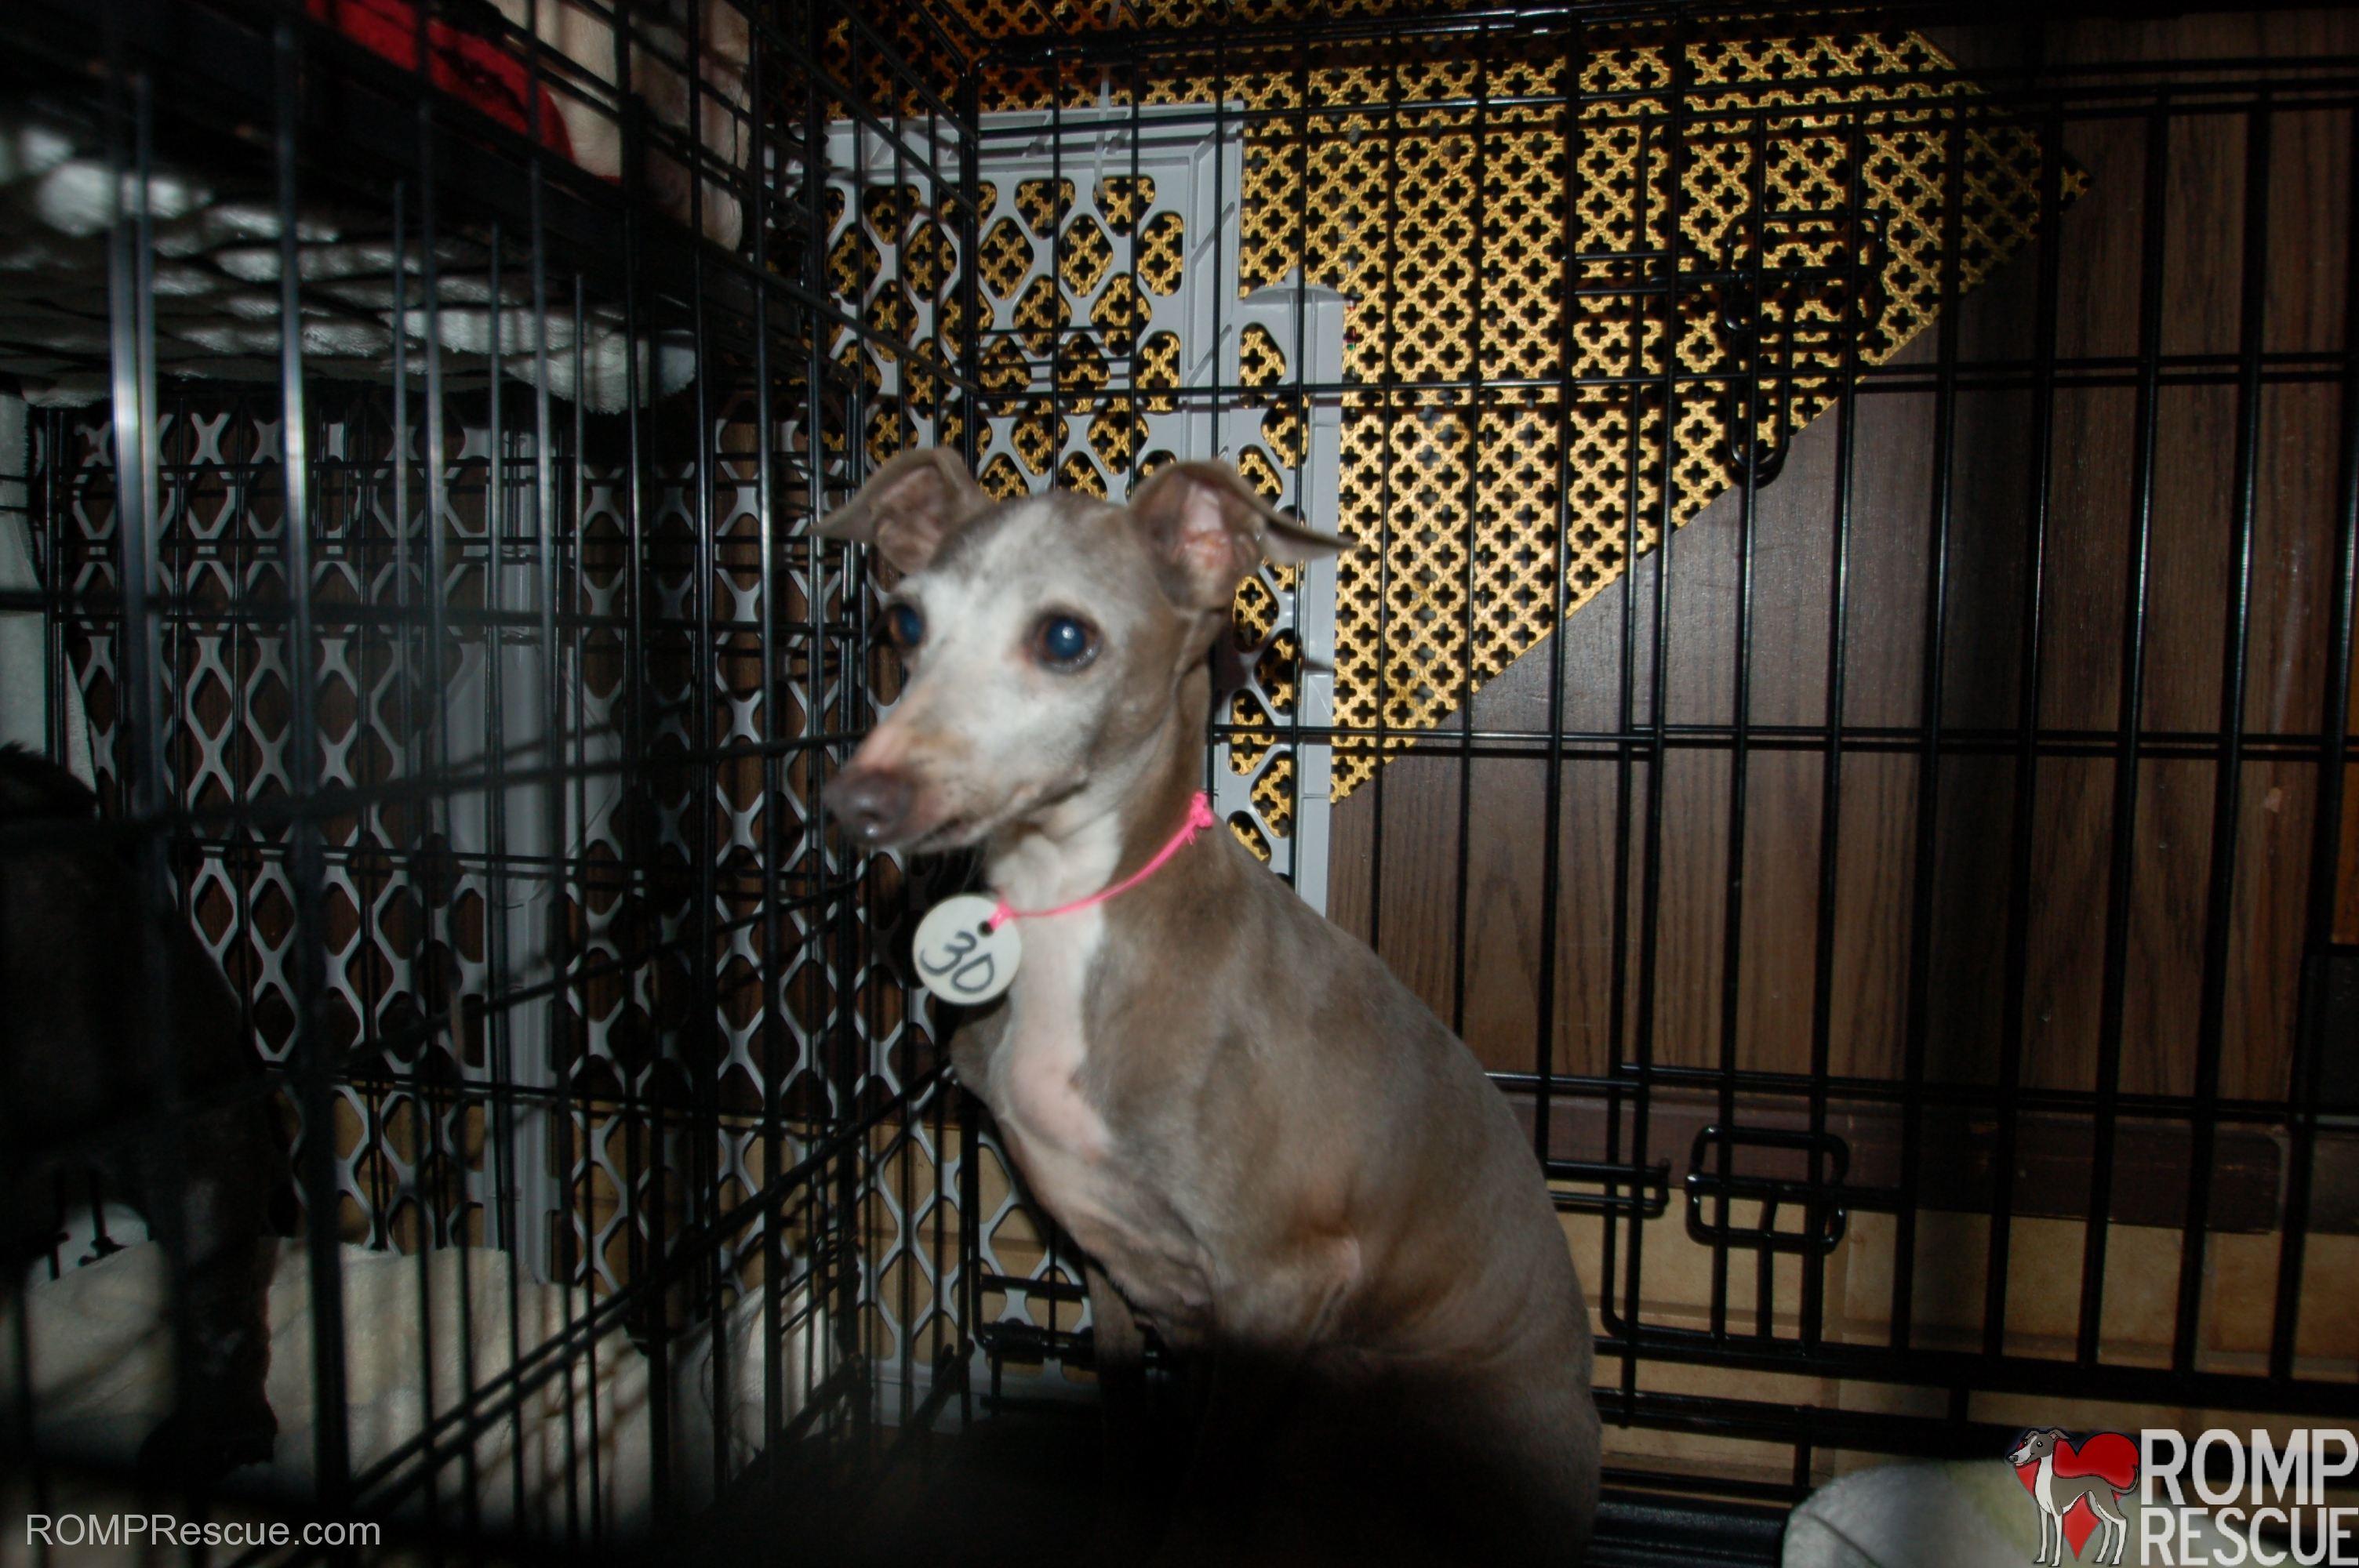 Italian greyhound, italian greyhounds, chicago italian greyhound, chicago mill rescue, chicago mill dog rescue, chicago dog rescue, chicago rescue, chicago iggy, chicago ig, chicago itlaian greyhound rescue, italian greyhound rescue, kai, saved from a mill, puppy mills, puppy mill rescue